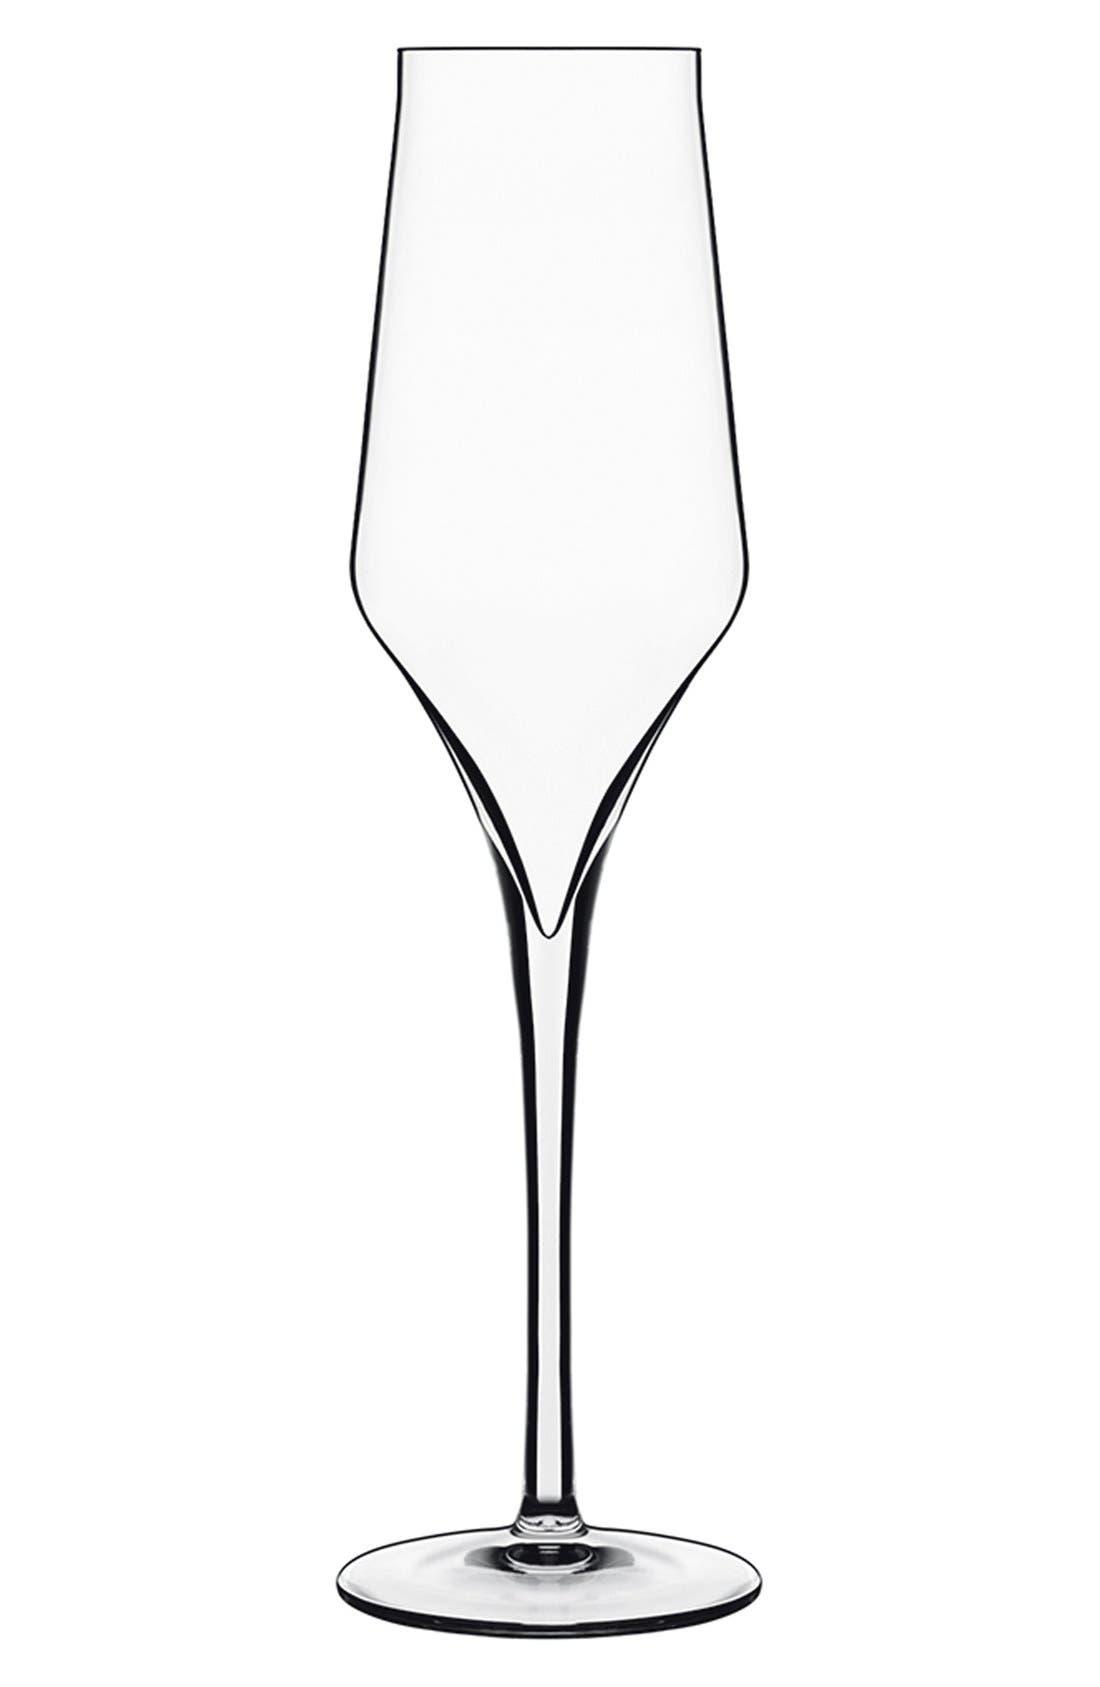 Main Image - Luigi Bormioli 'Supremo' Champagne Flutes (Set of 6)